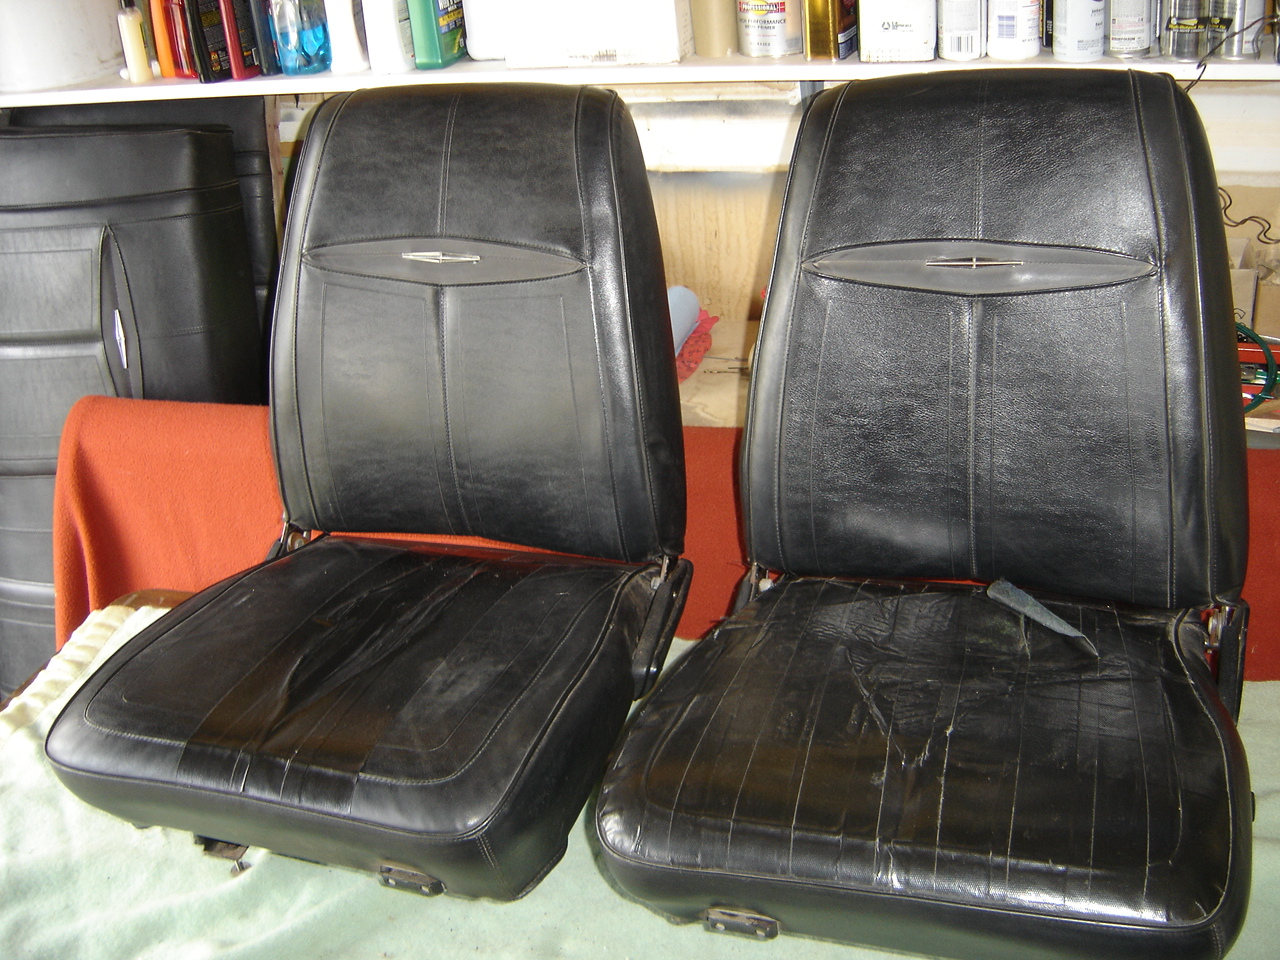 1968 Dodge Dart Bucket Seat & Rear Seat Restoration